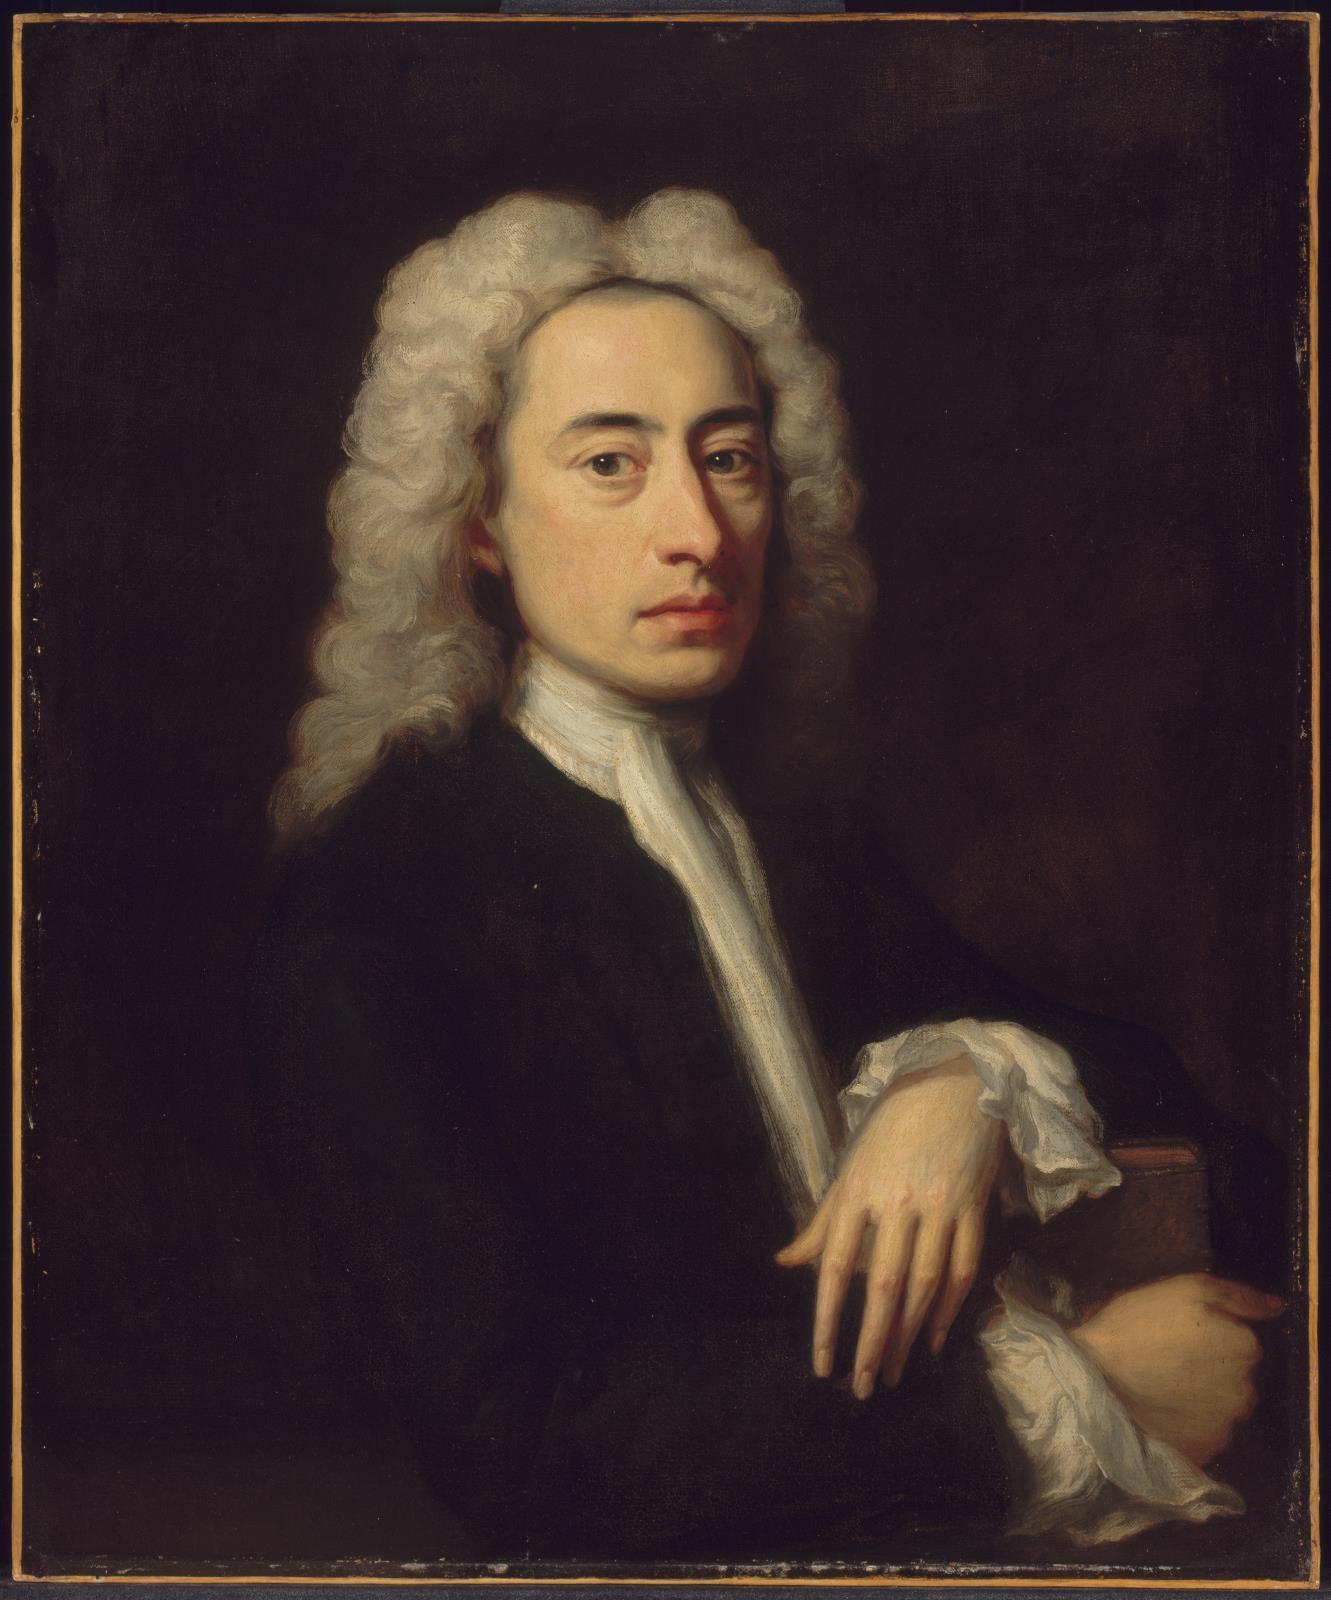 File:Alexander Pope circa 1736.jpeg